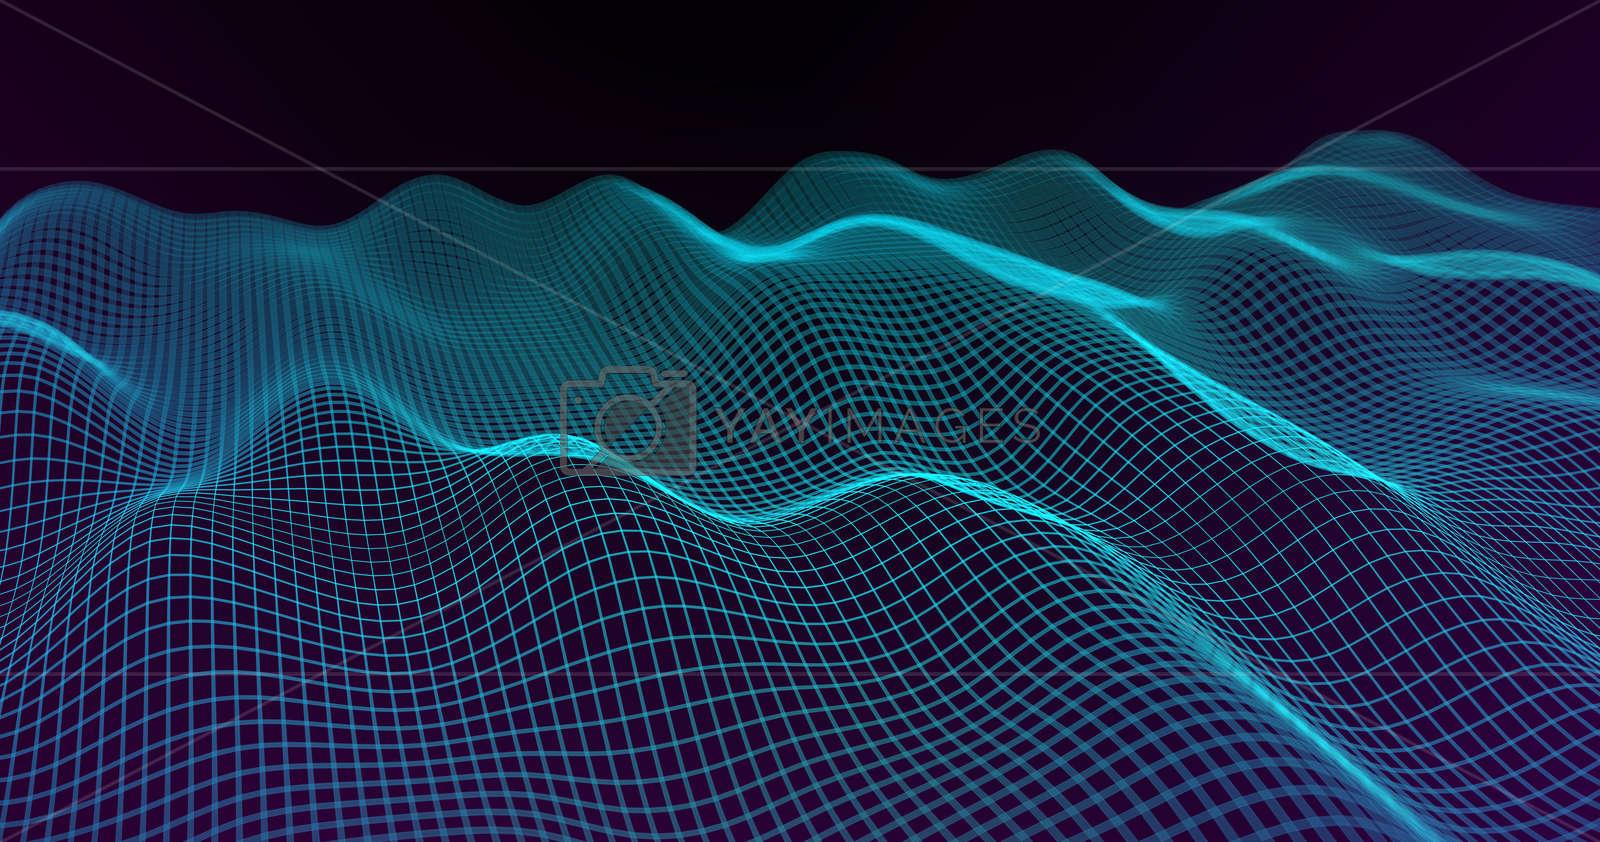 Abstract Big Data Futuristic Light Wallpaper Background - Illustration - HD Wallpaper